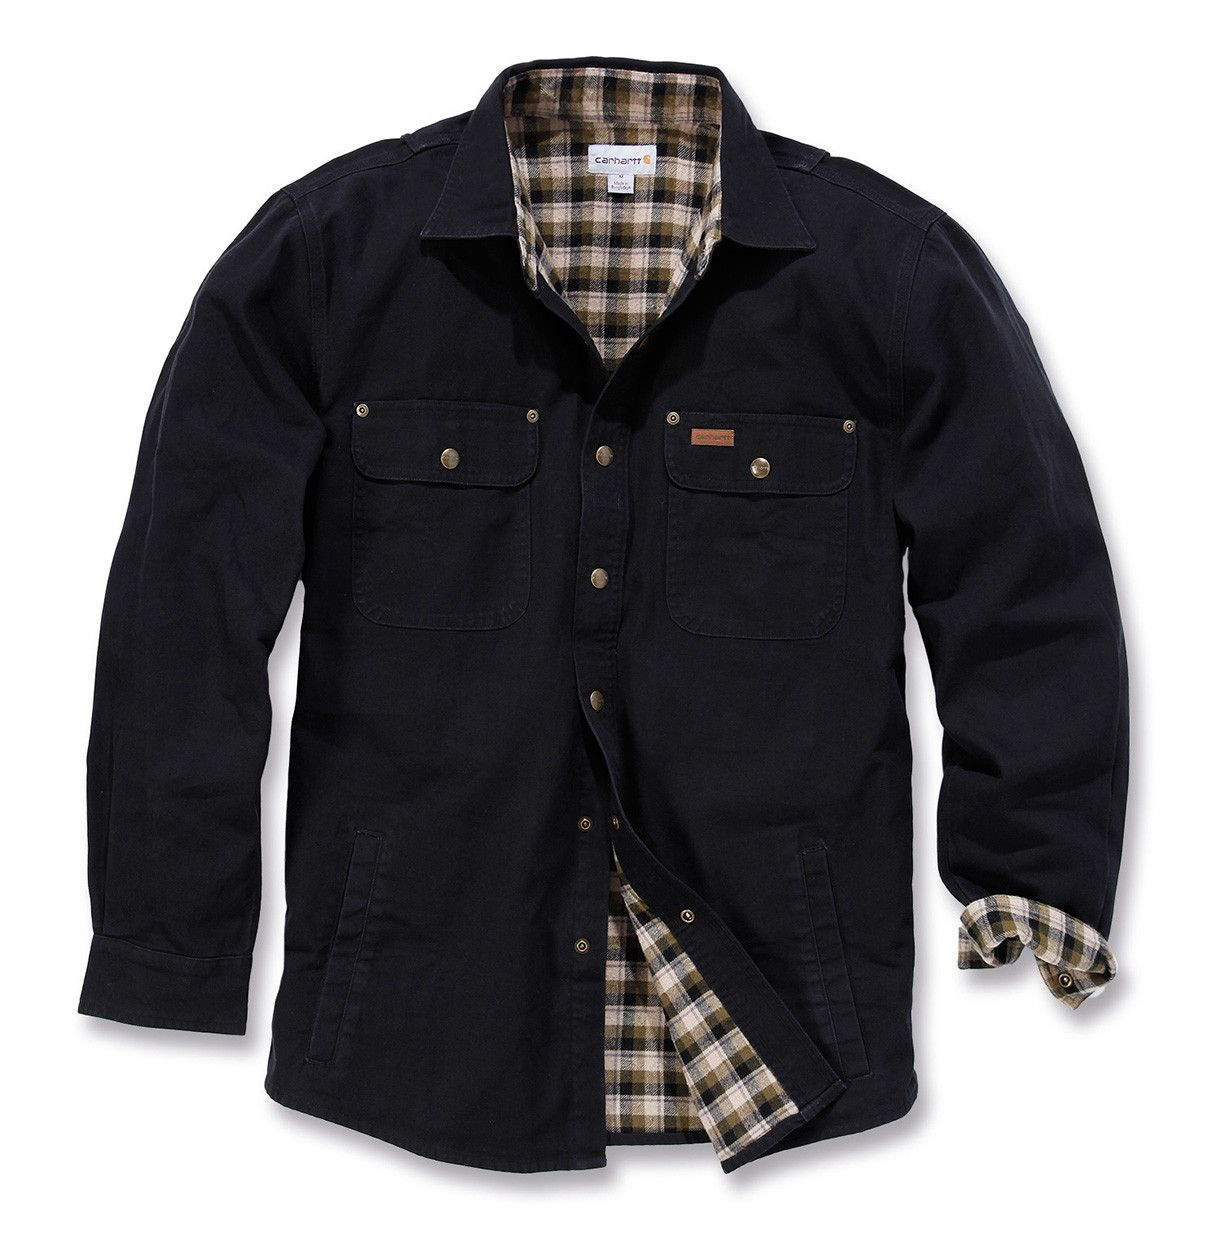 Shirt jacket design - Carhartt Weathered Canvas Shirt Jacket Workwear Jackets Workwear Best Workwear